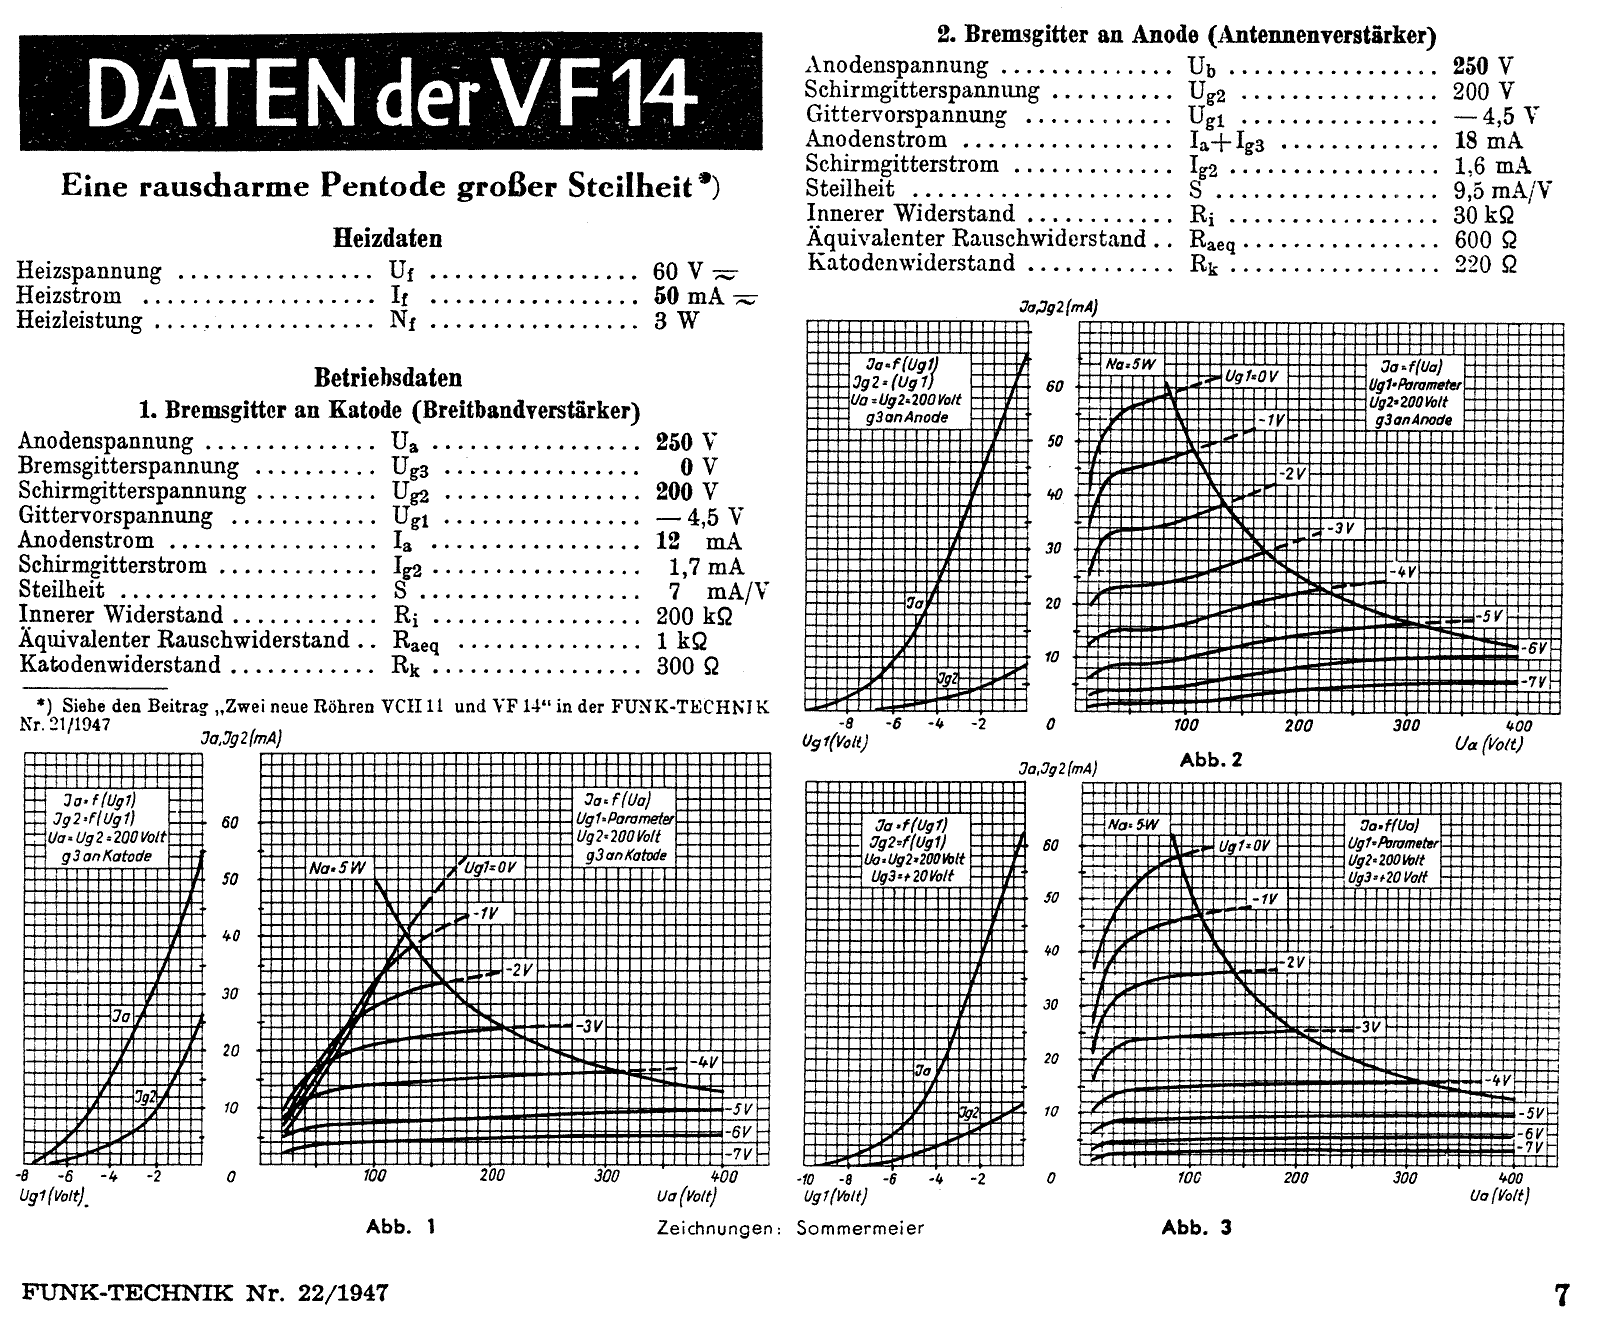 VF 14 TUBE DATASHEET.png